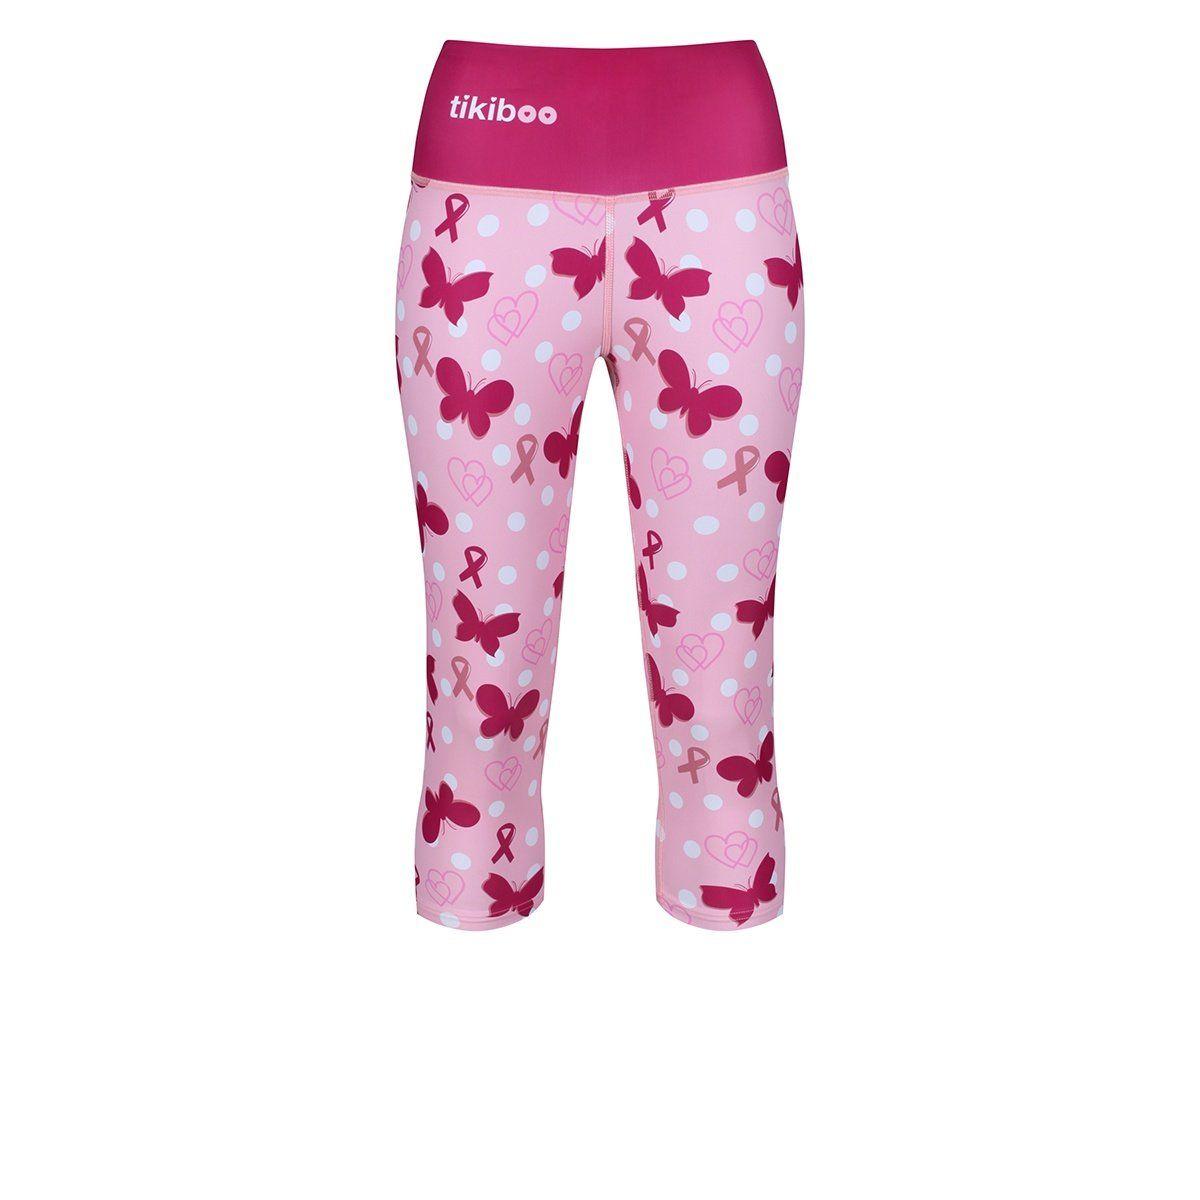 Tikiboo_Capri-Pink_Flutter_BreastCancerNow-FrontProduct.jpg